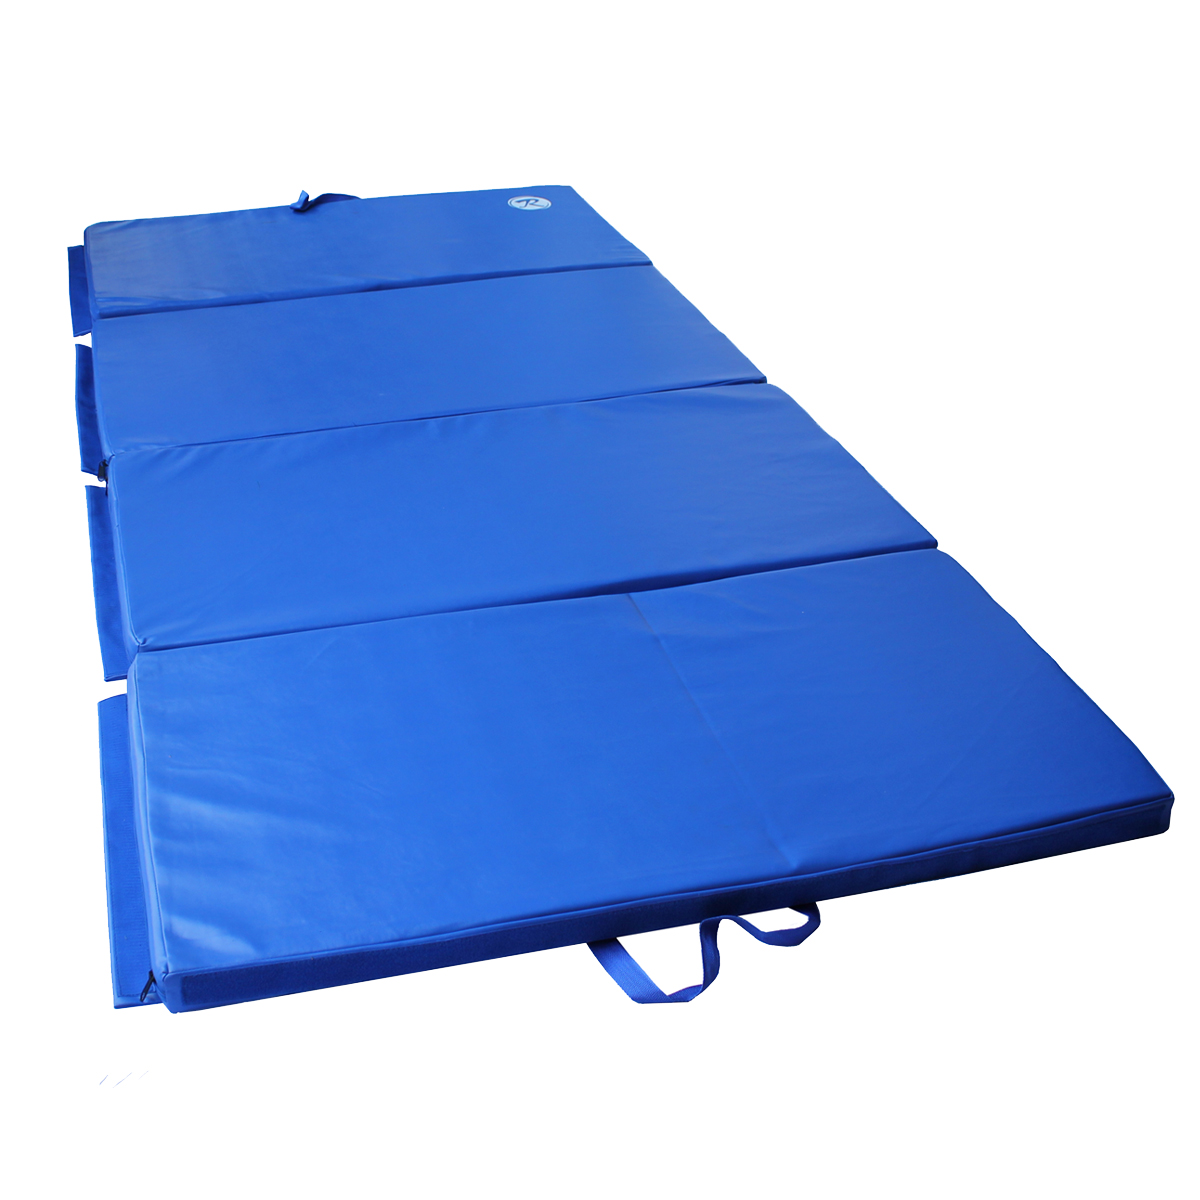 RCL FGM1514 Folding Gymnastics Tumbling Exercise Mat